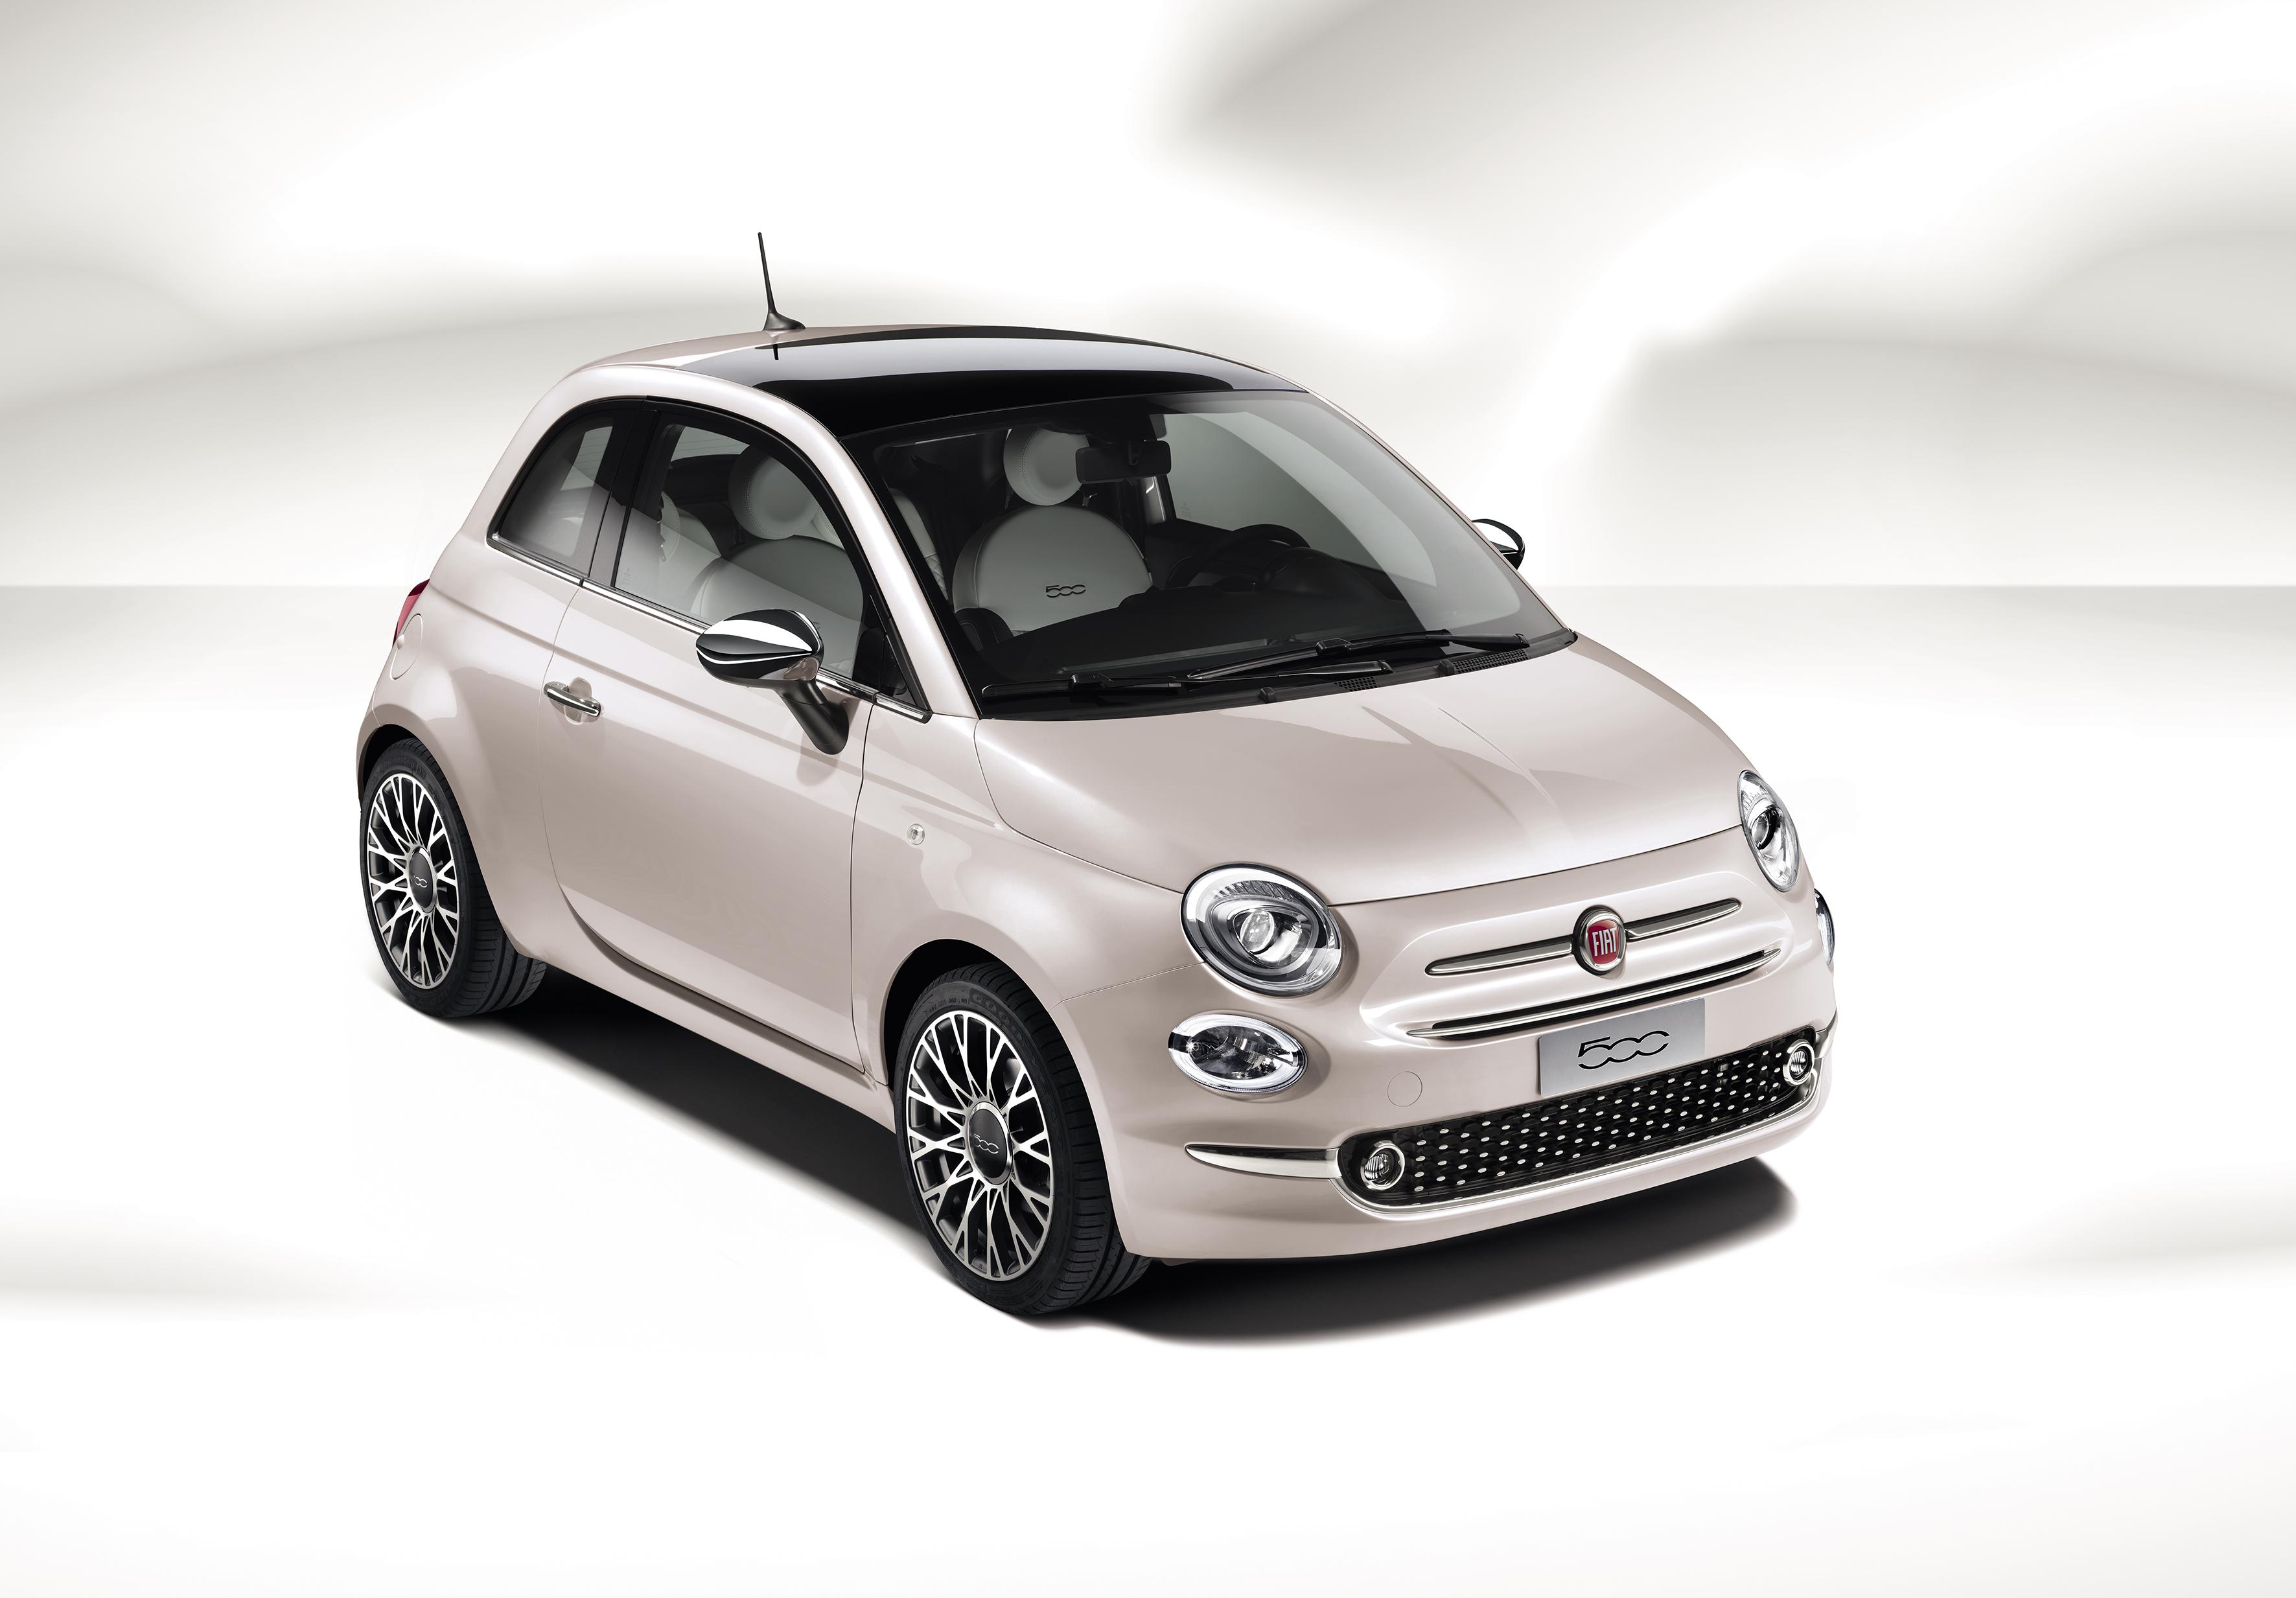 New Star And Rockstar To Head Up Fiat 500 Range Press Fiat Group